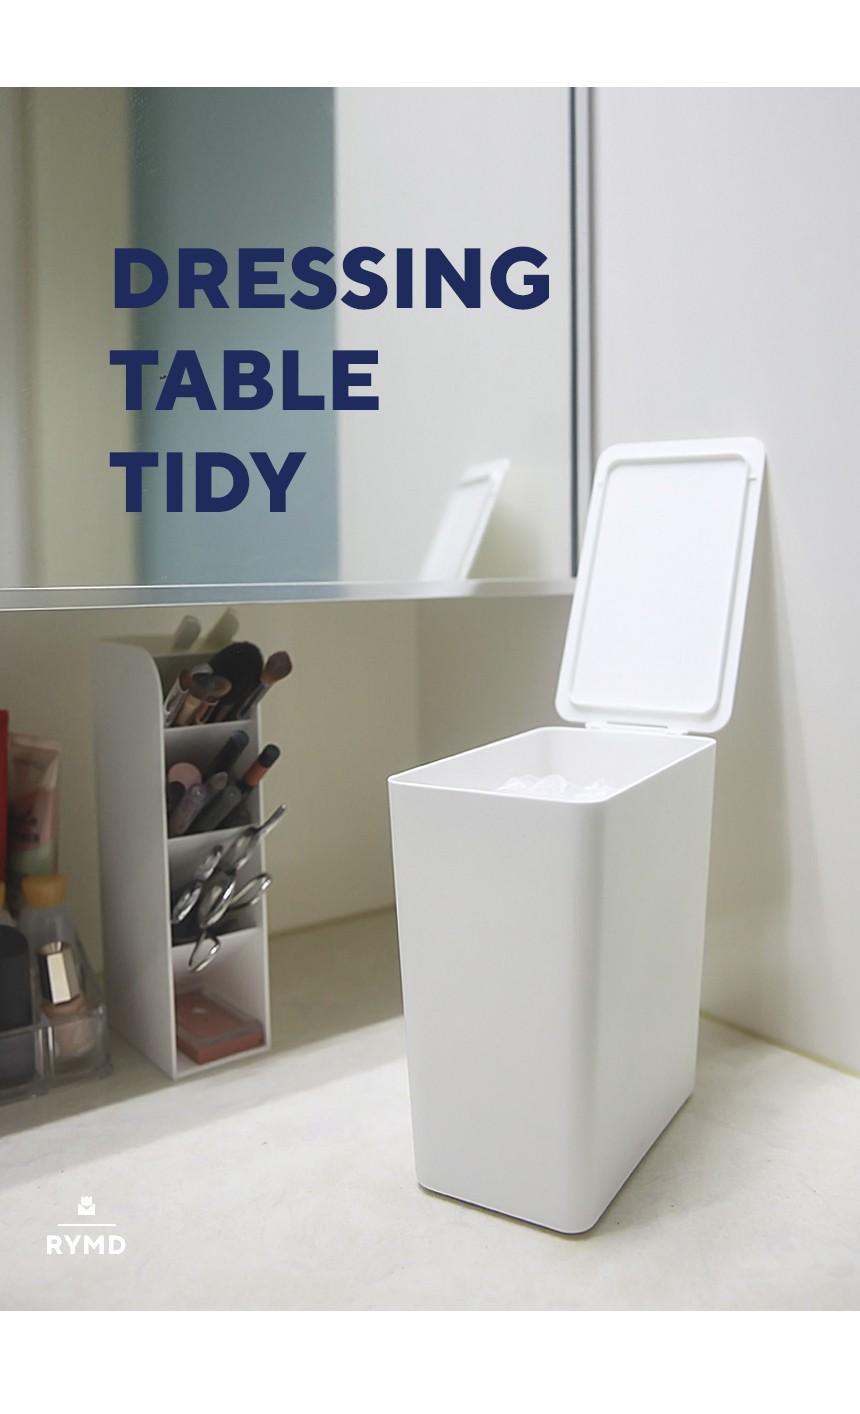 DRESSING_TABLE_TIDY_07.jpg